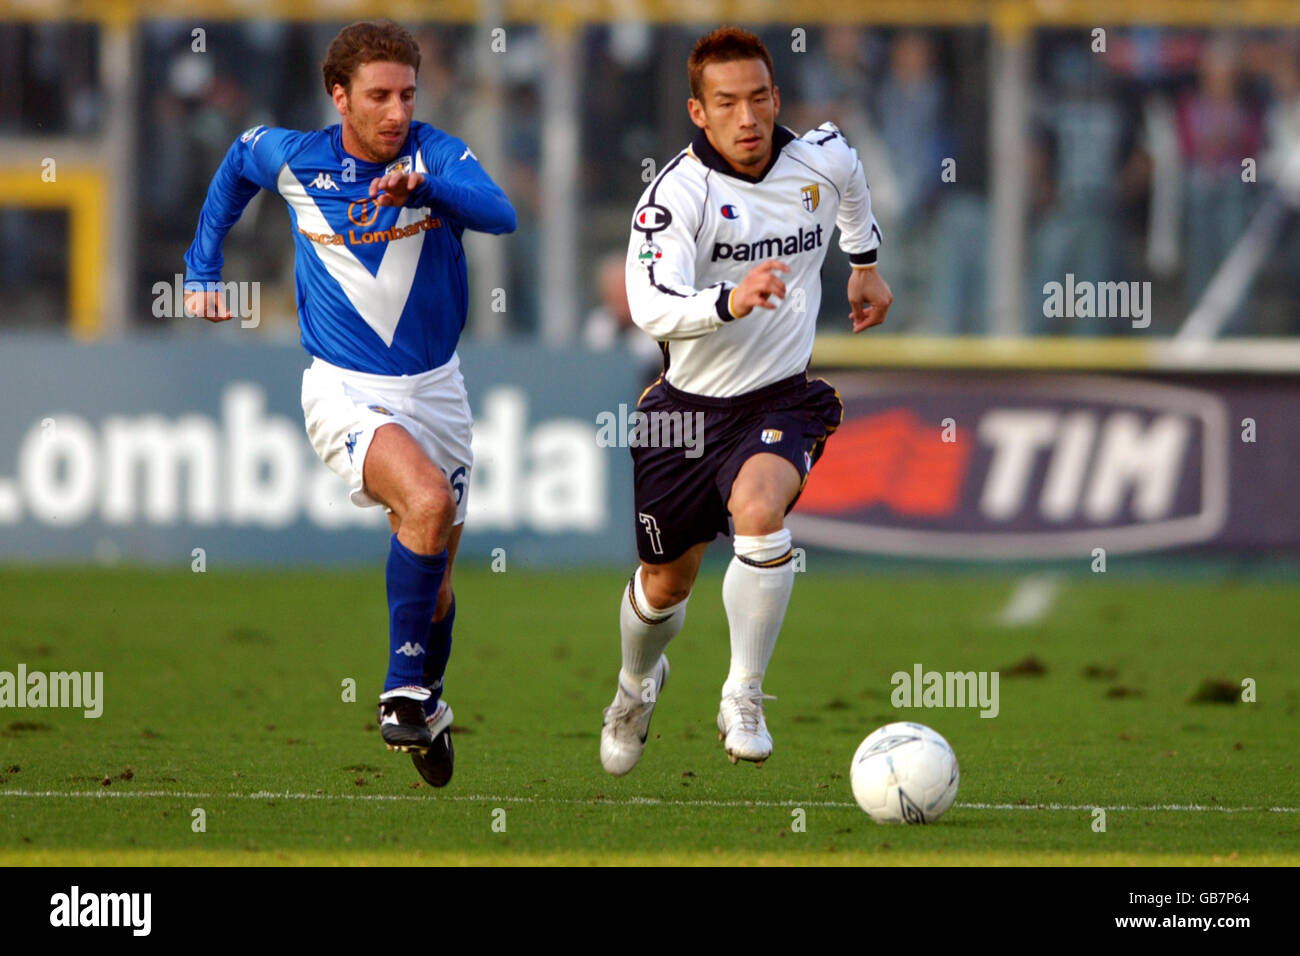 Soccer - Italian Serie A - Brescia v Parma Stock Photo: 110194508 ...